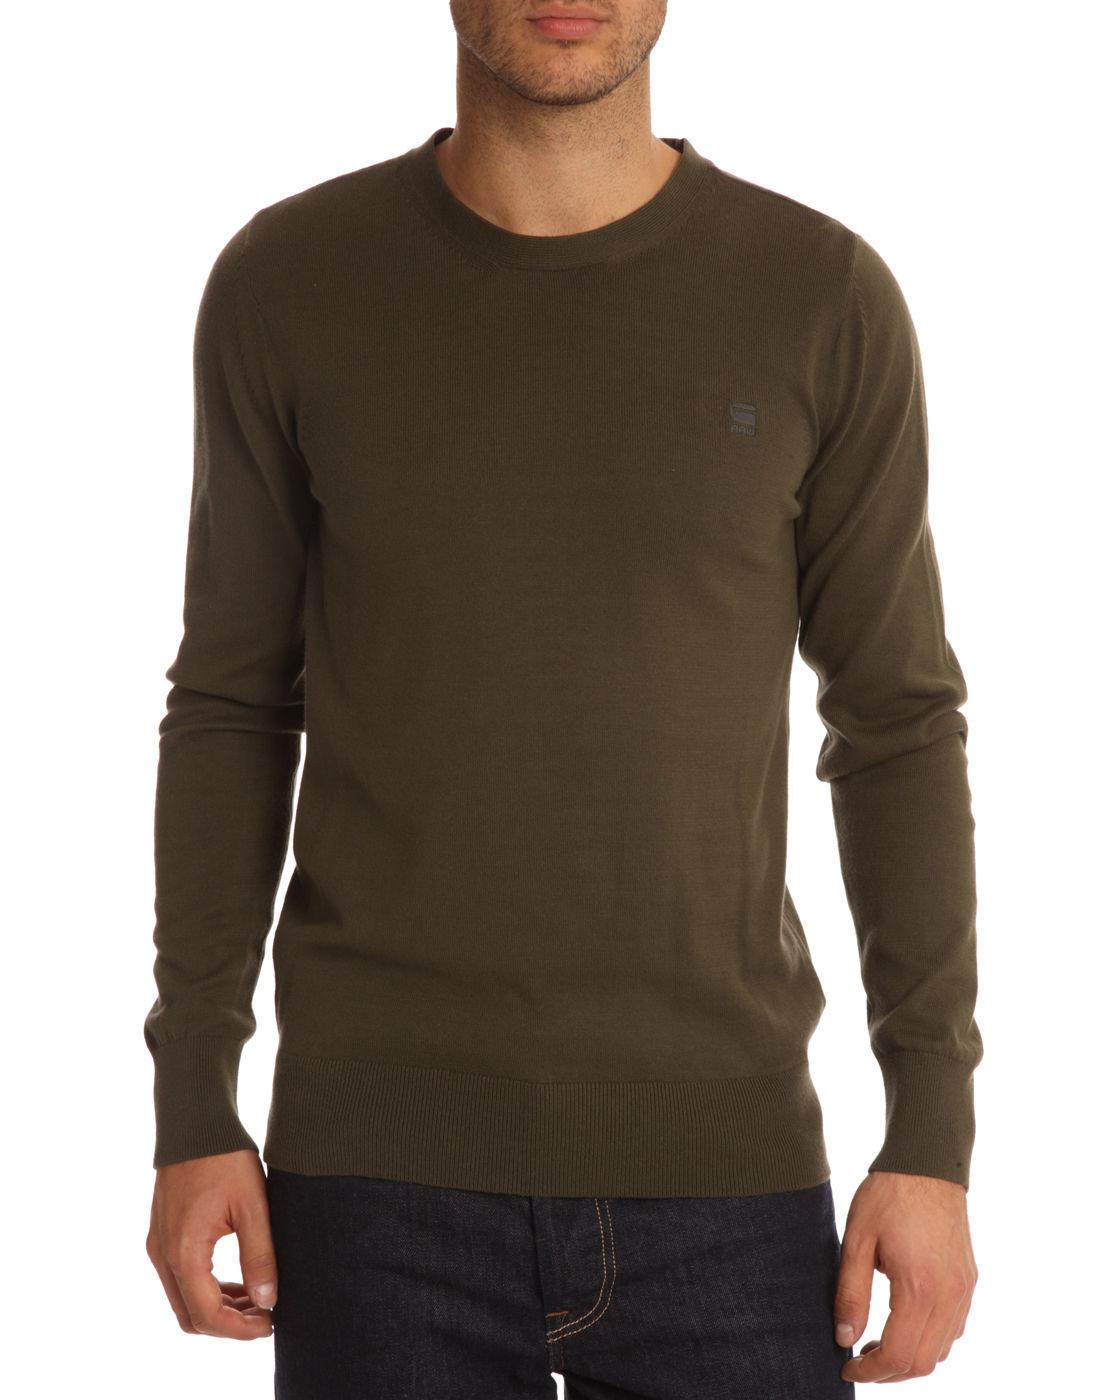 g star raw amos khaki sweater in khaki for men lyst. Black Bedroom Furniture Sets. Home Design Ideas